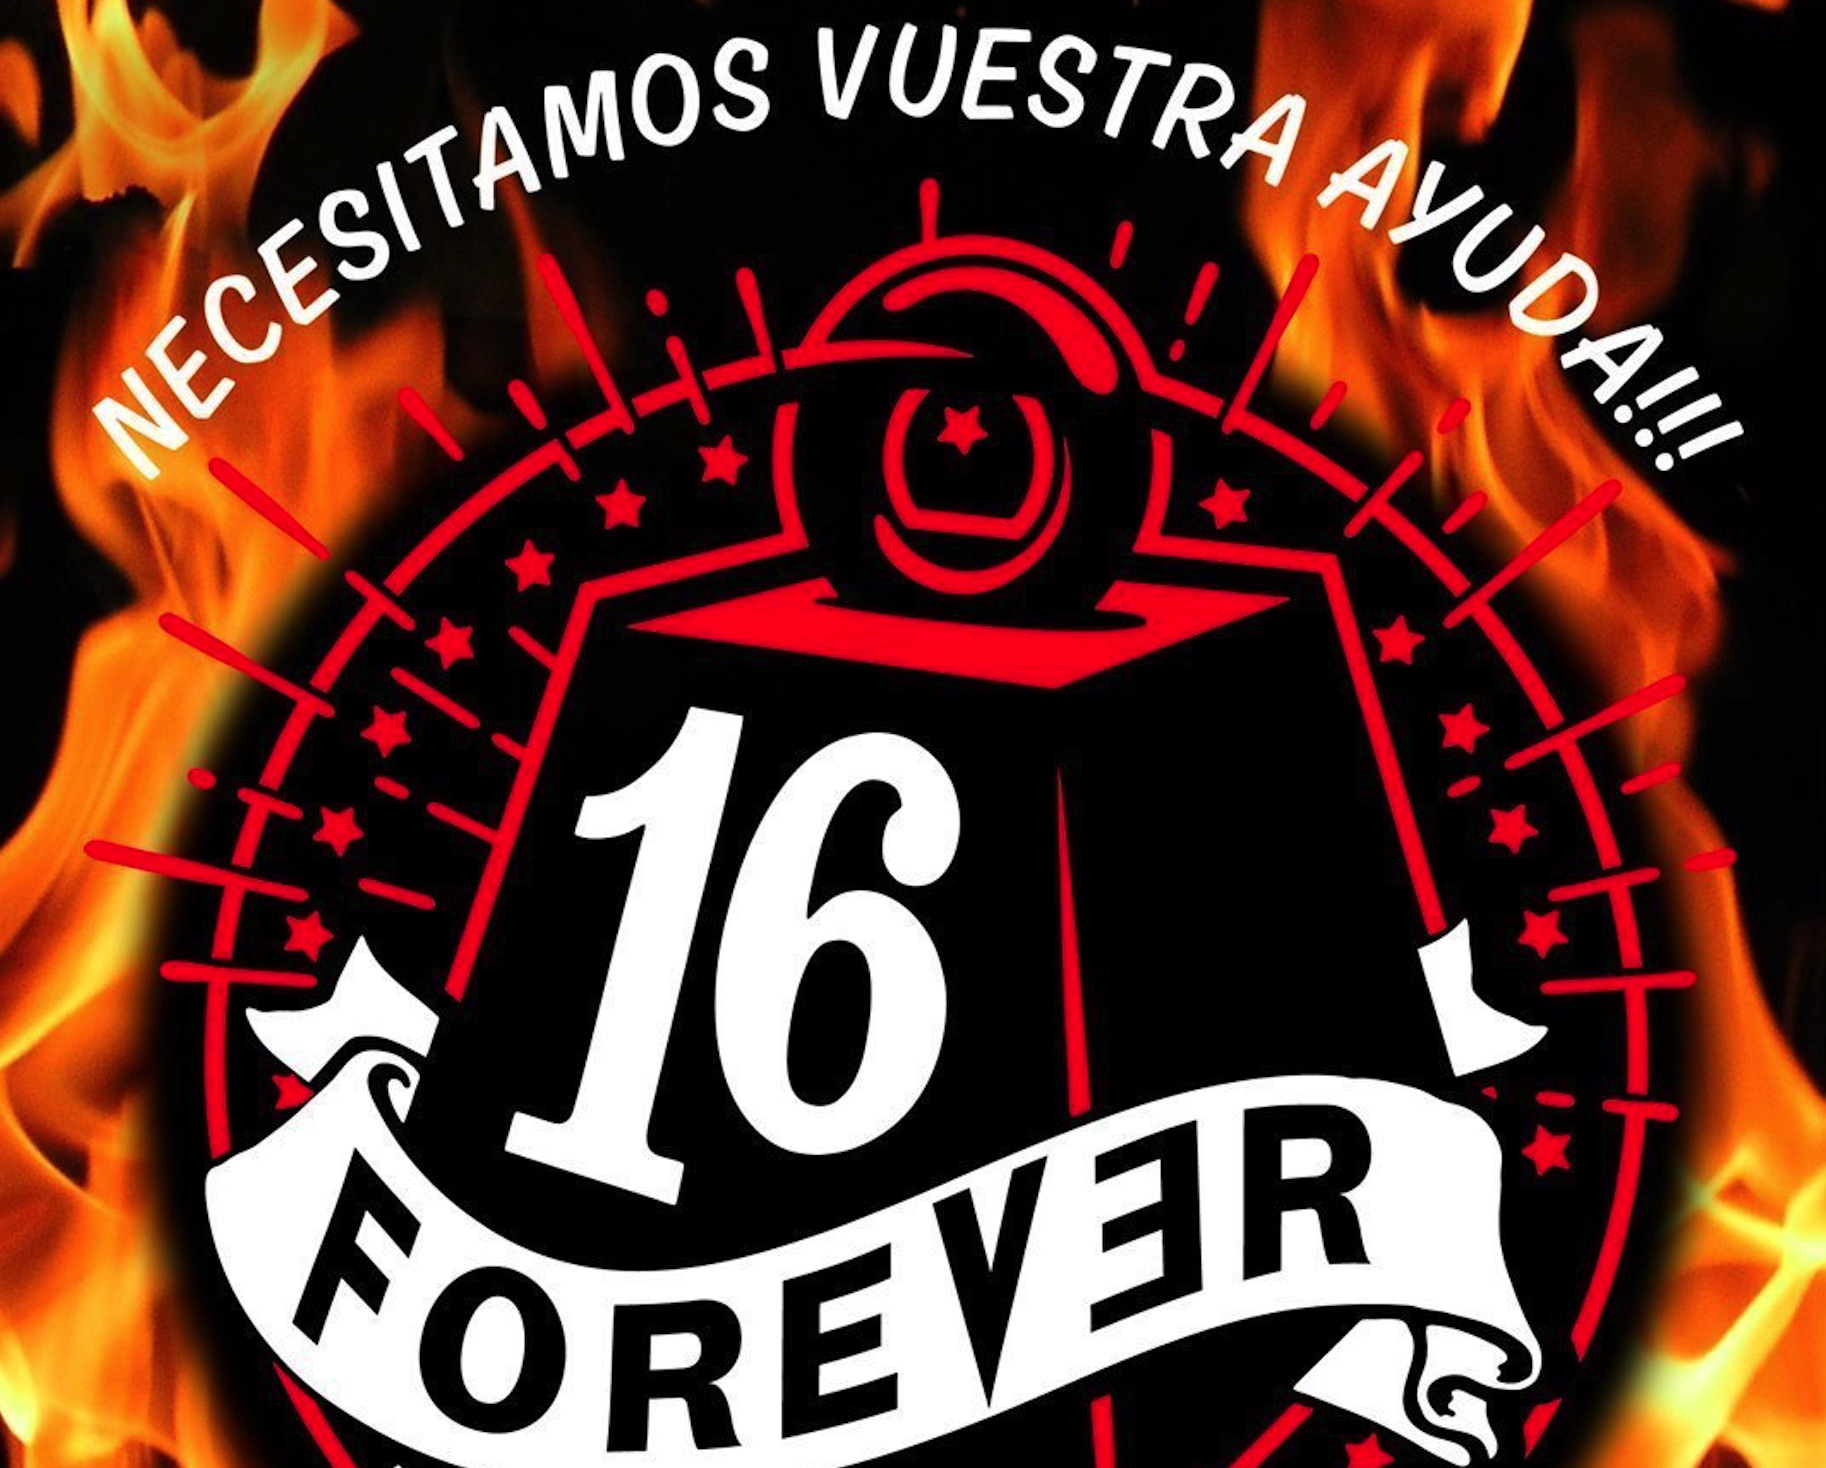 16 Toneladas Forever